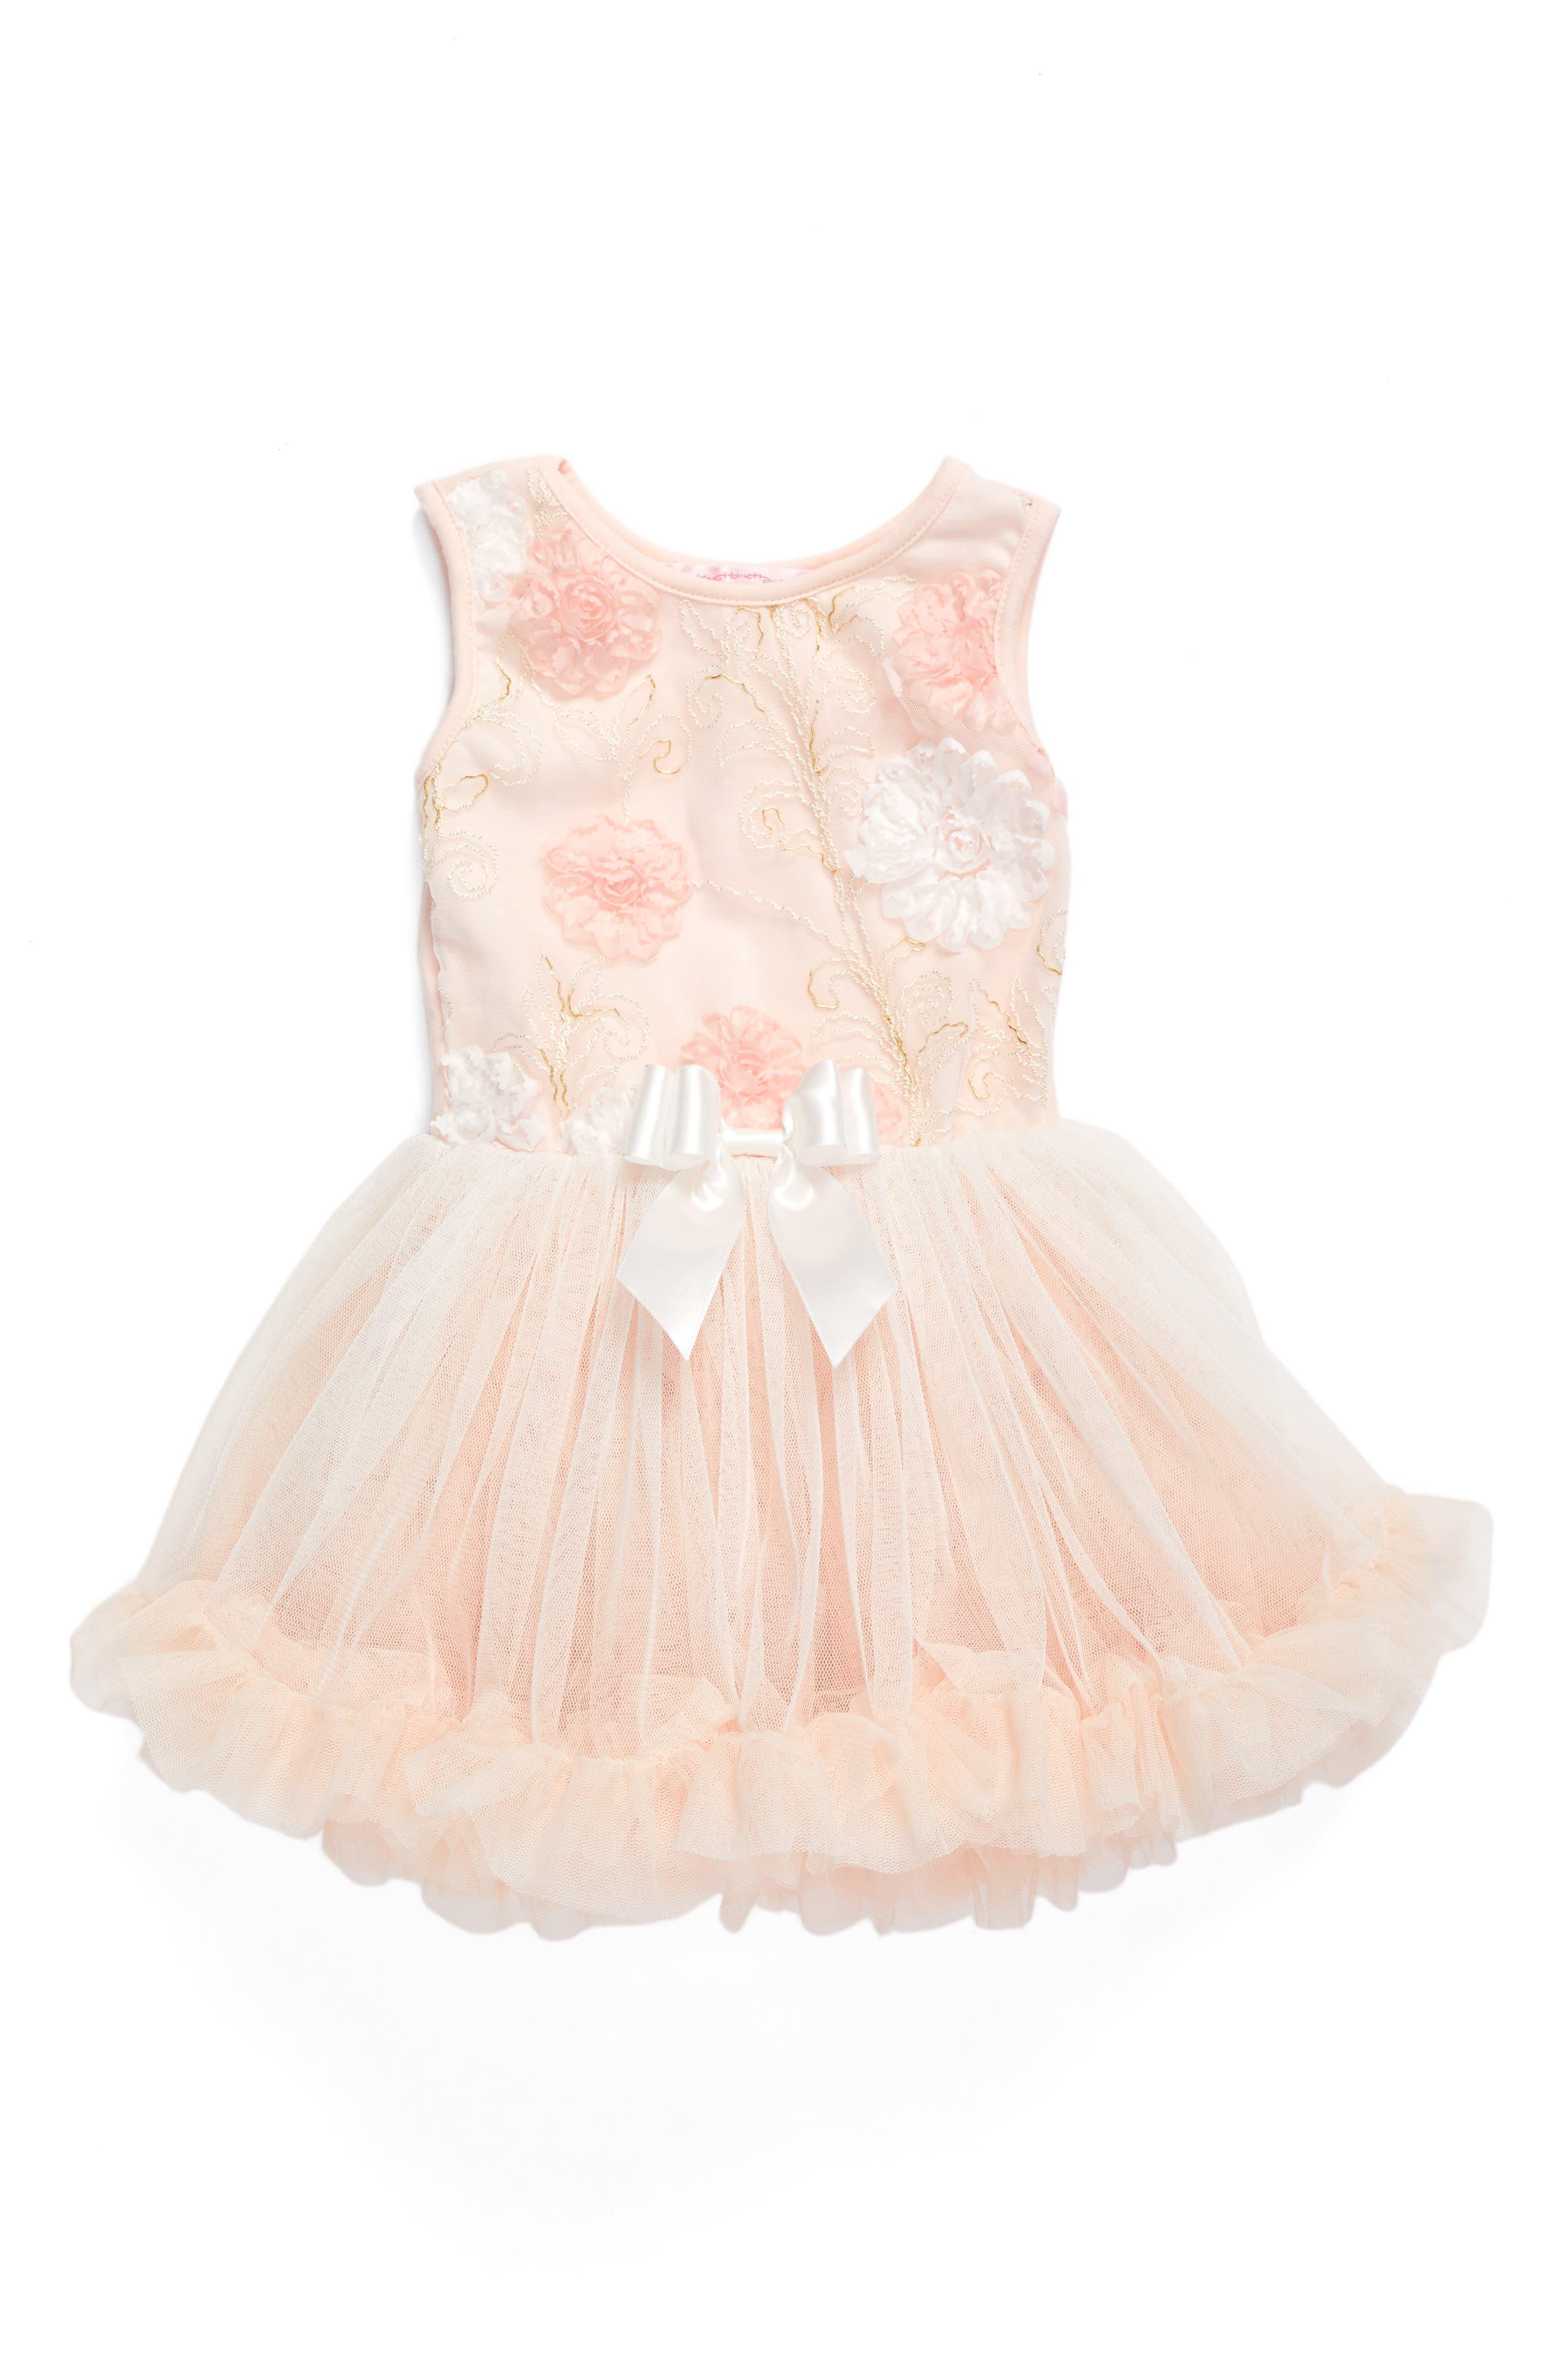 Peach Elegant Flower Fit & Flare Dress,                         Main,                         color, 950